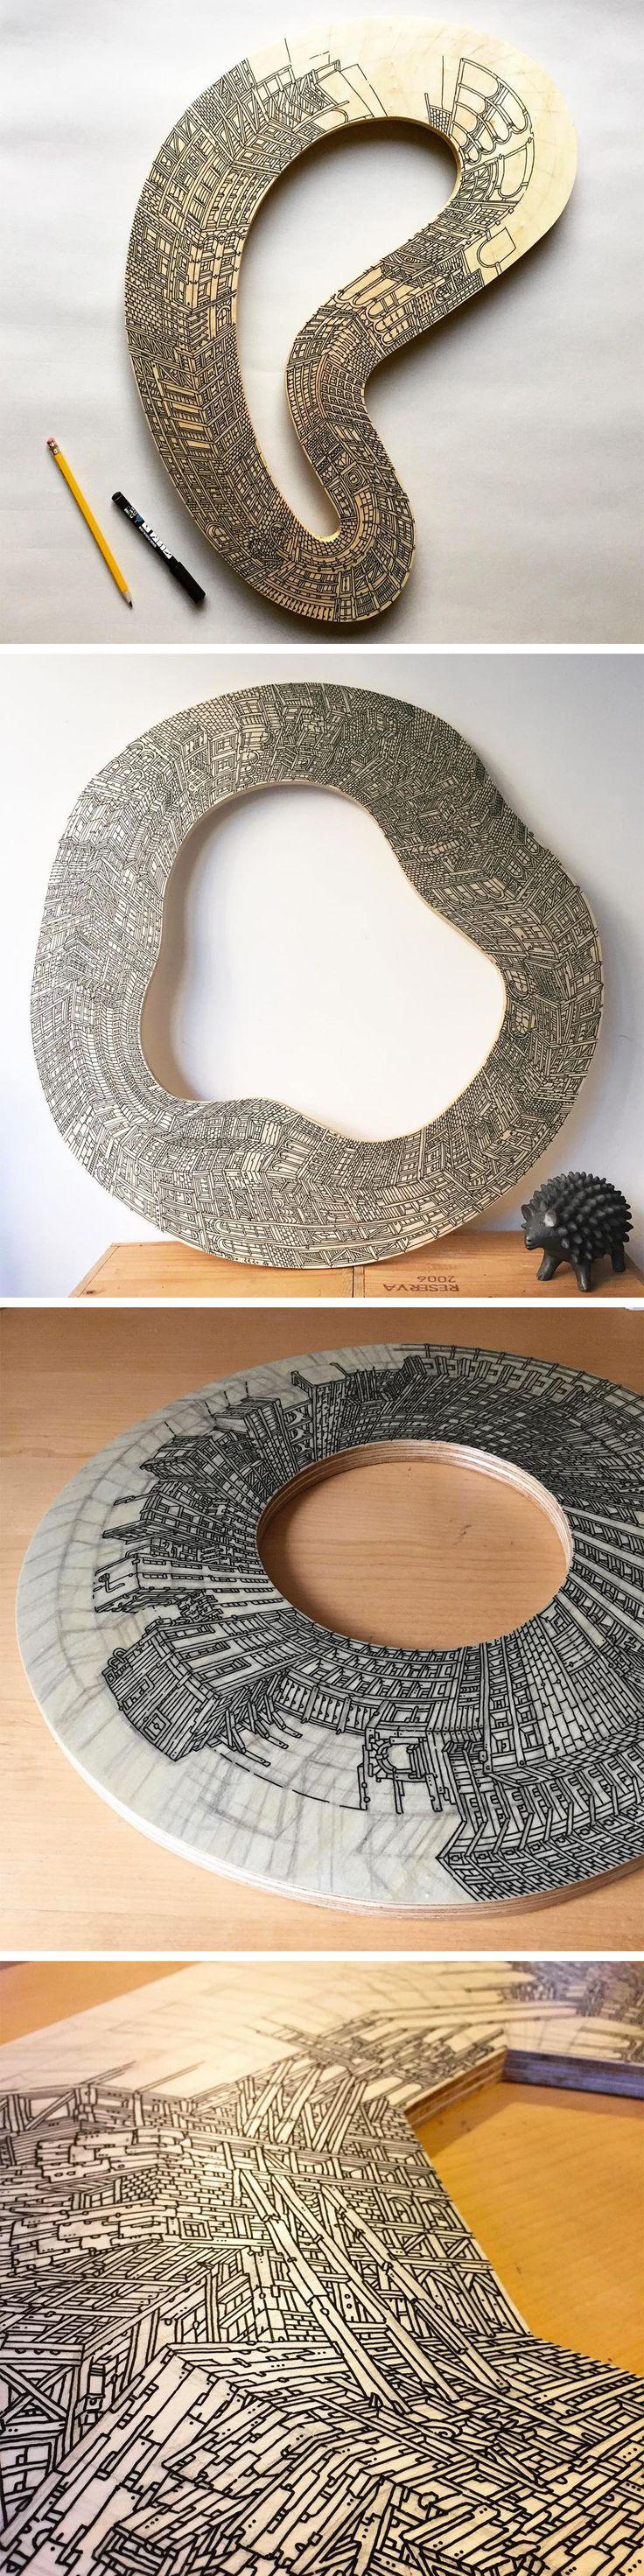 Artist Vasco Mourao Illustrates 'Infinite' Skyscrapers on Circular Pieces of Plywood